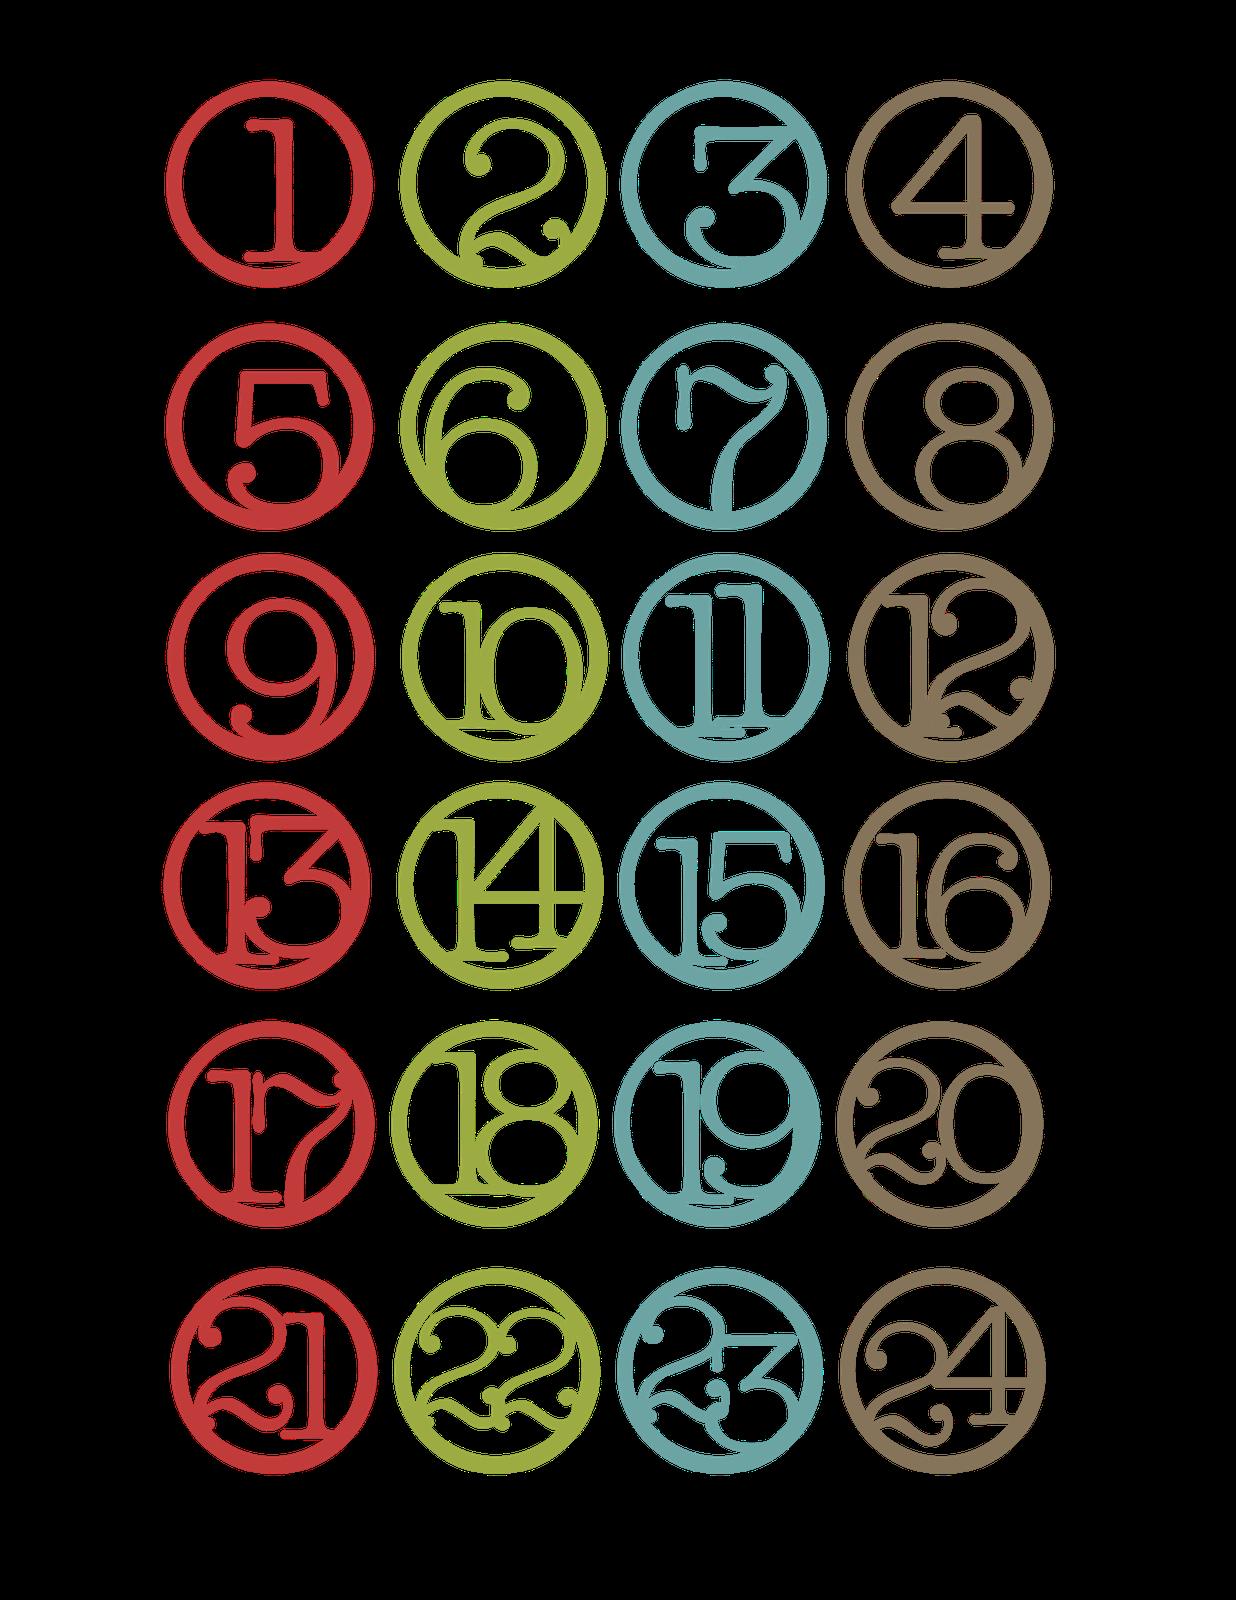 8 Best Images of Printable Number Countdown - Free ...